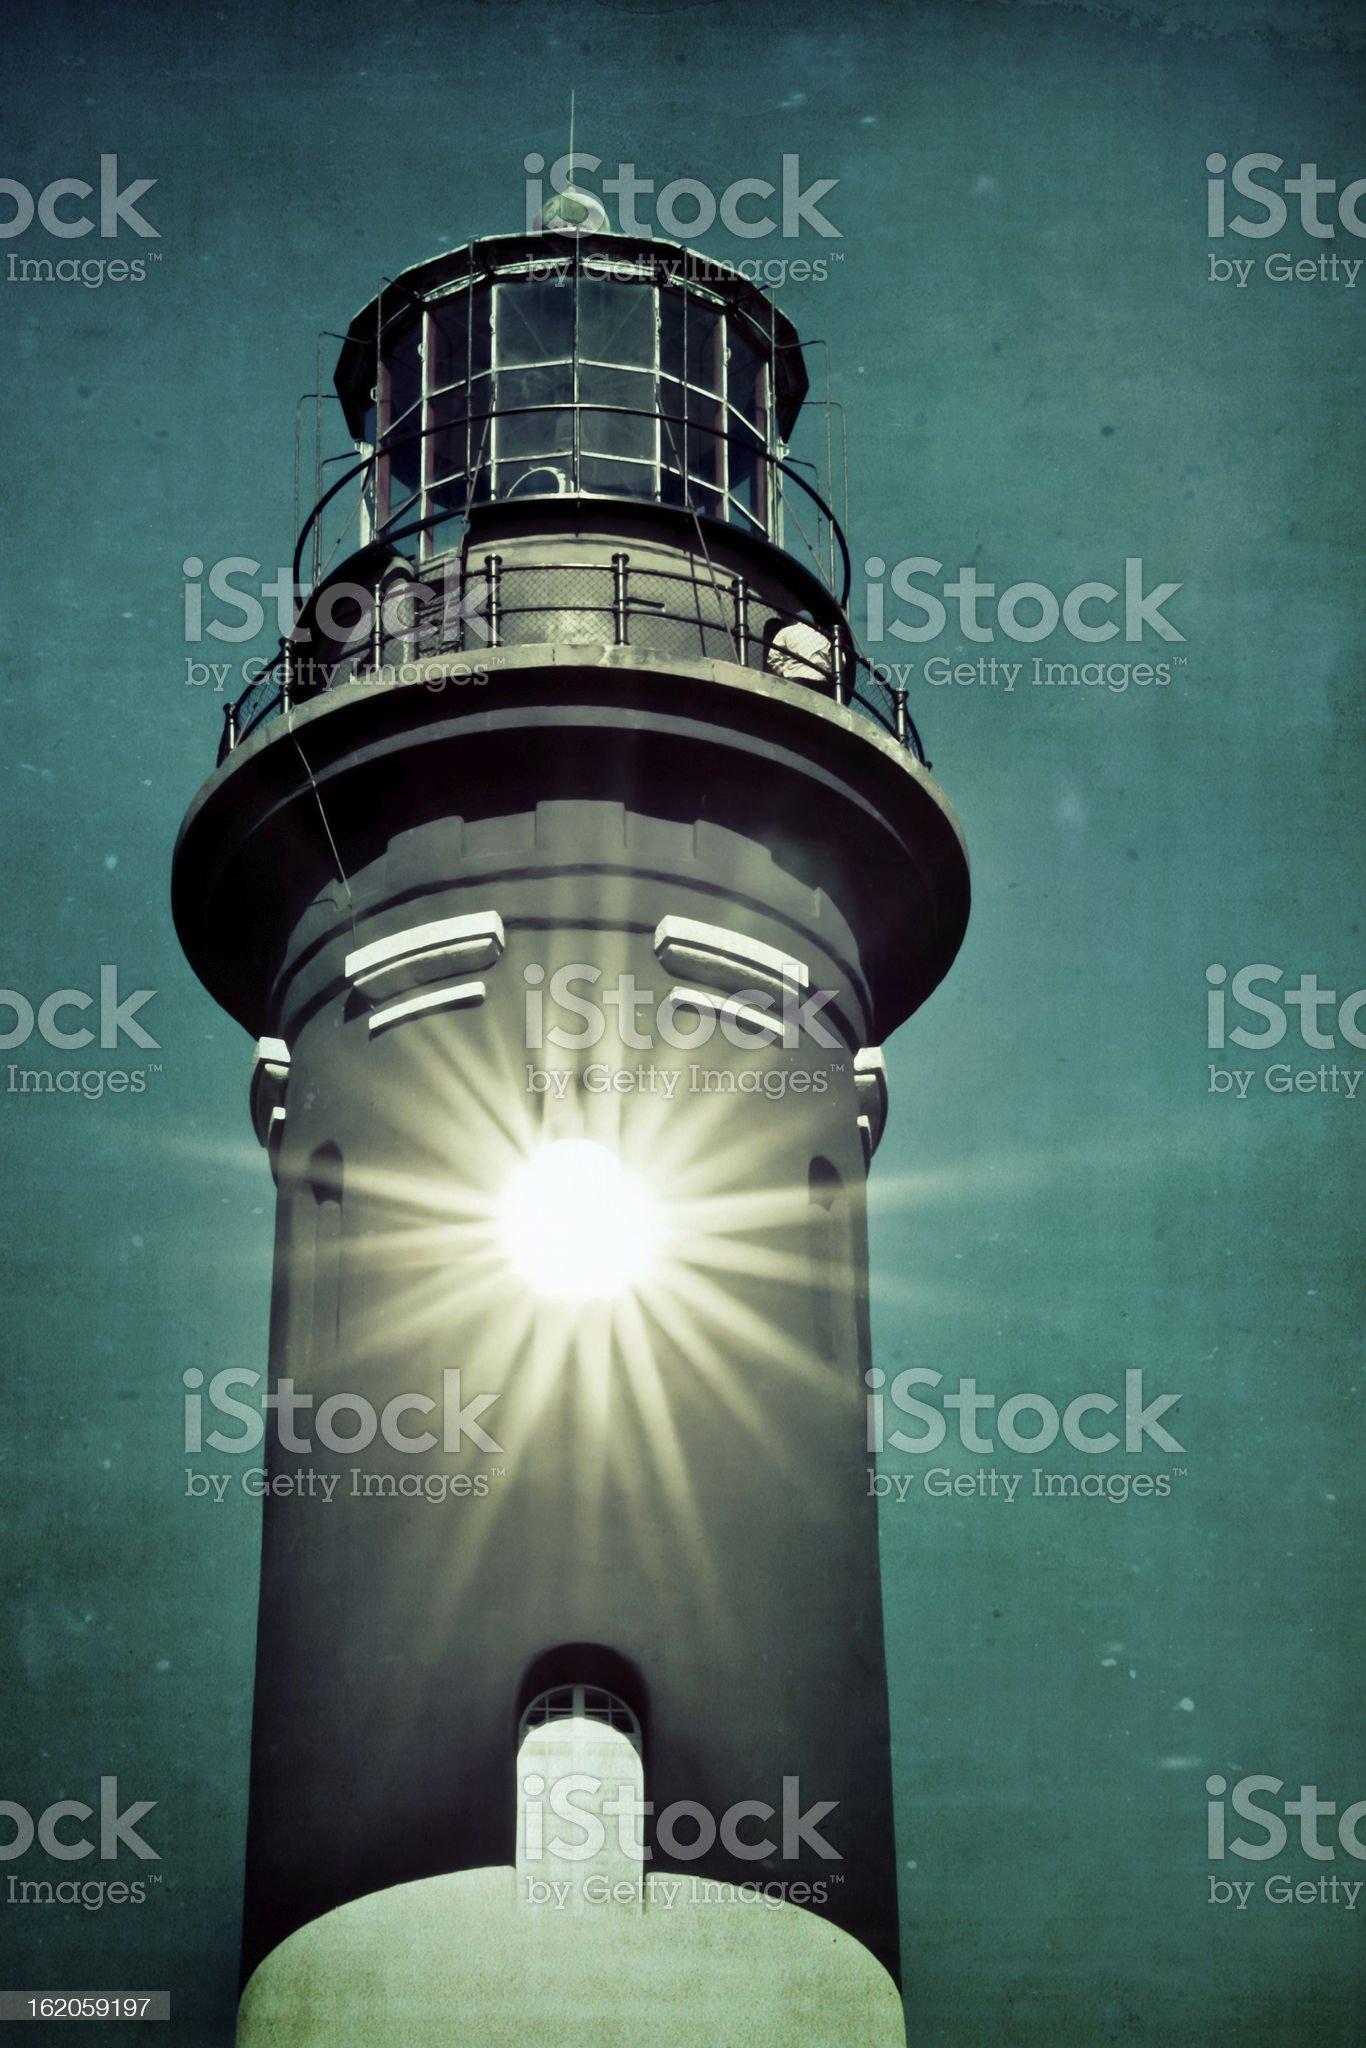 Vintage Style Lighthouse royalty-free stock photo